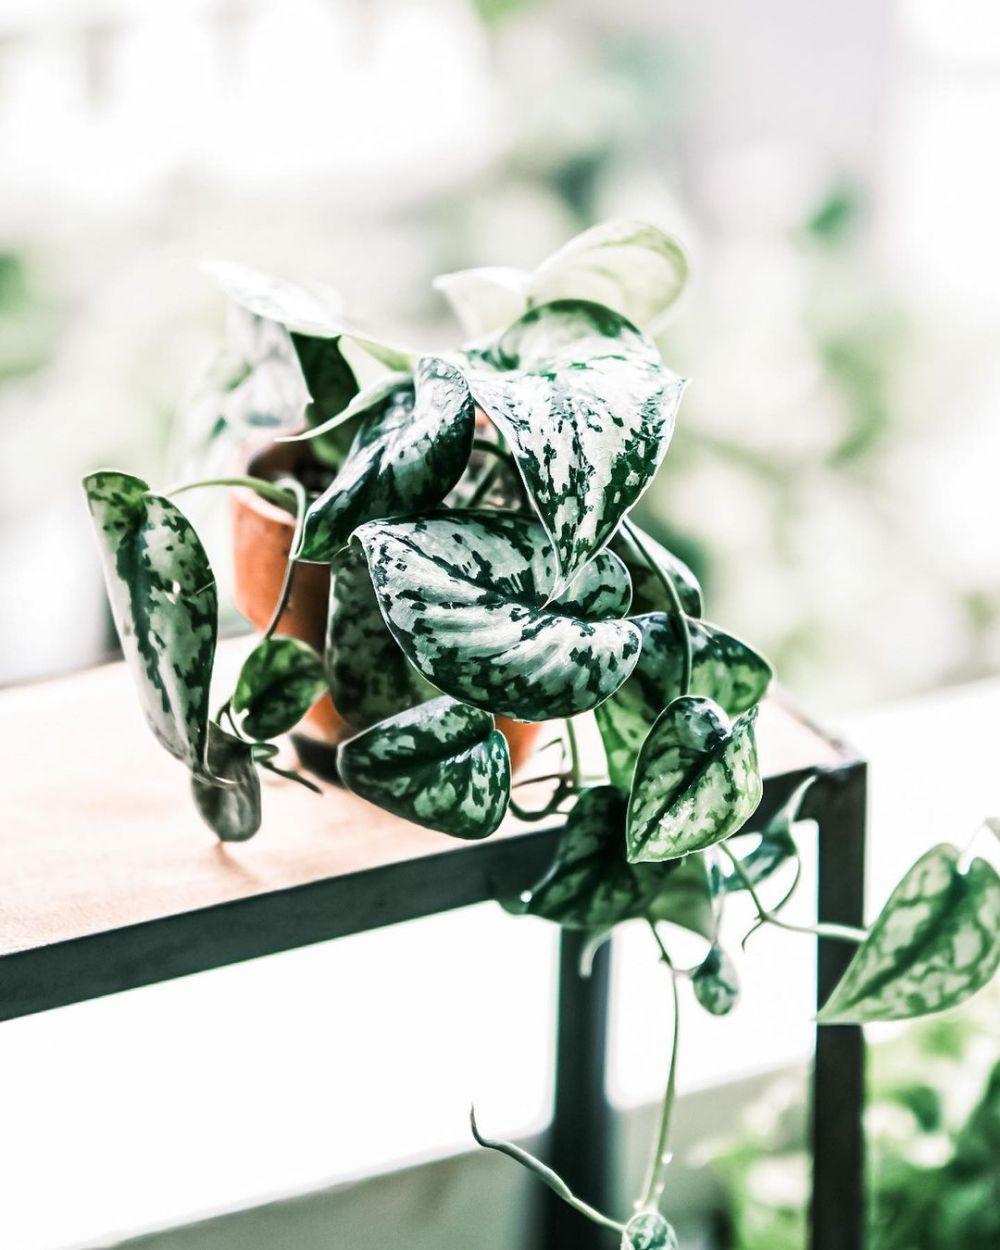 harga tanaman hias gantung ©Instagram